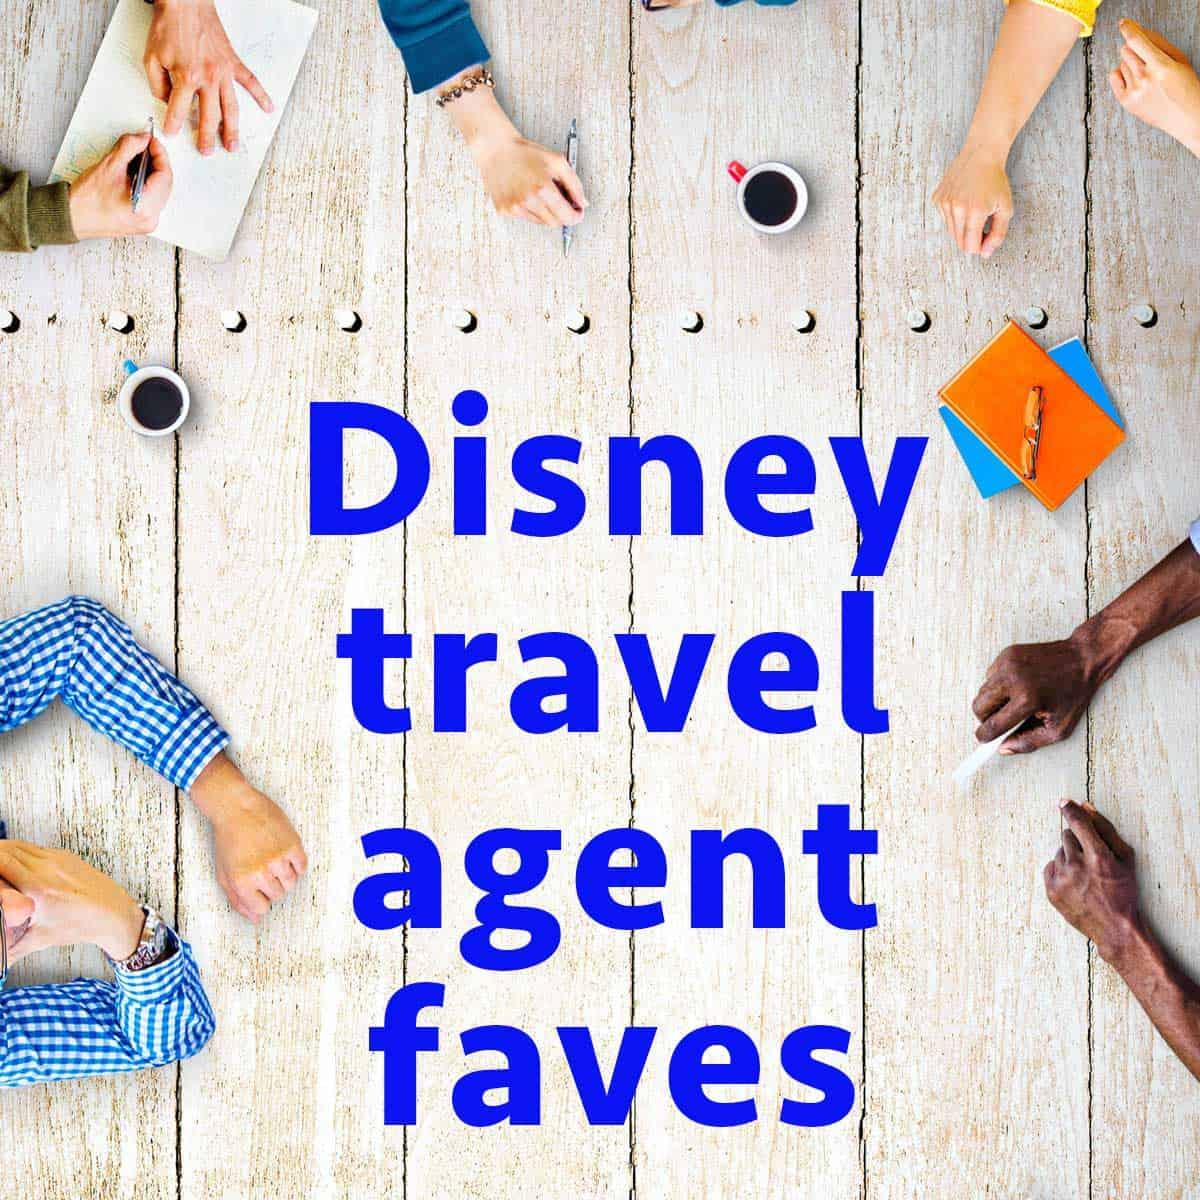 Disney travel agent faves  PREP142